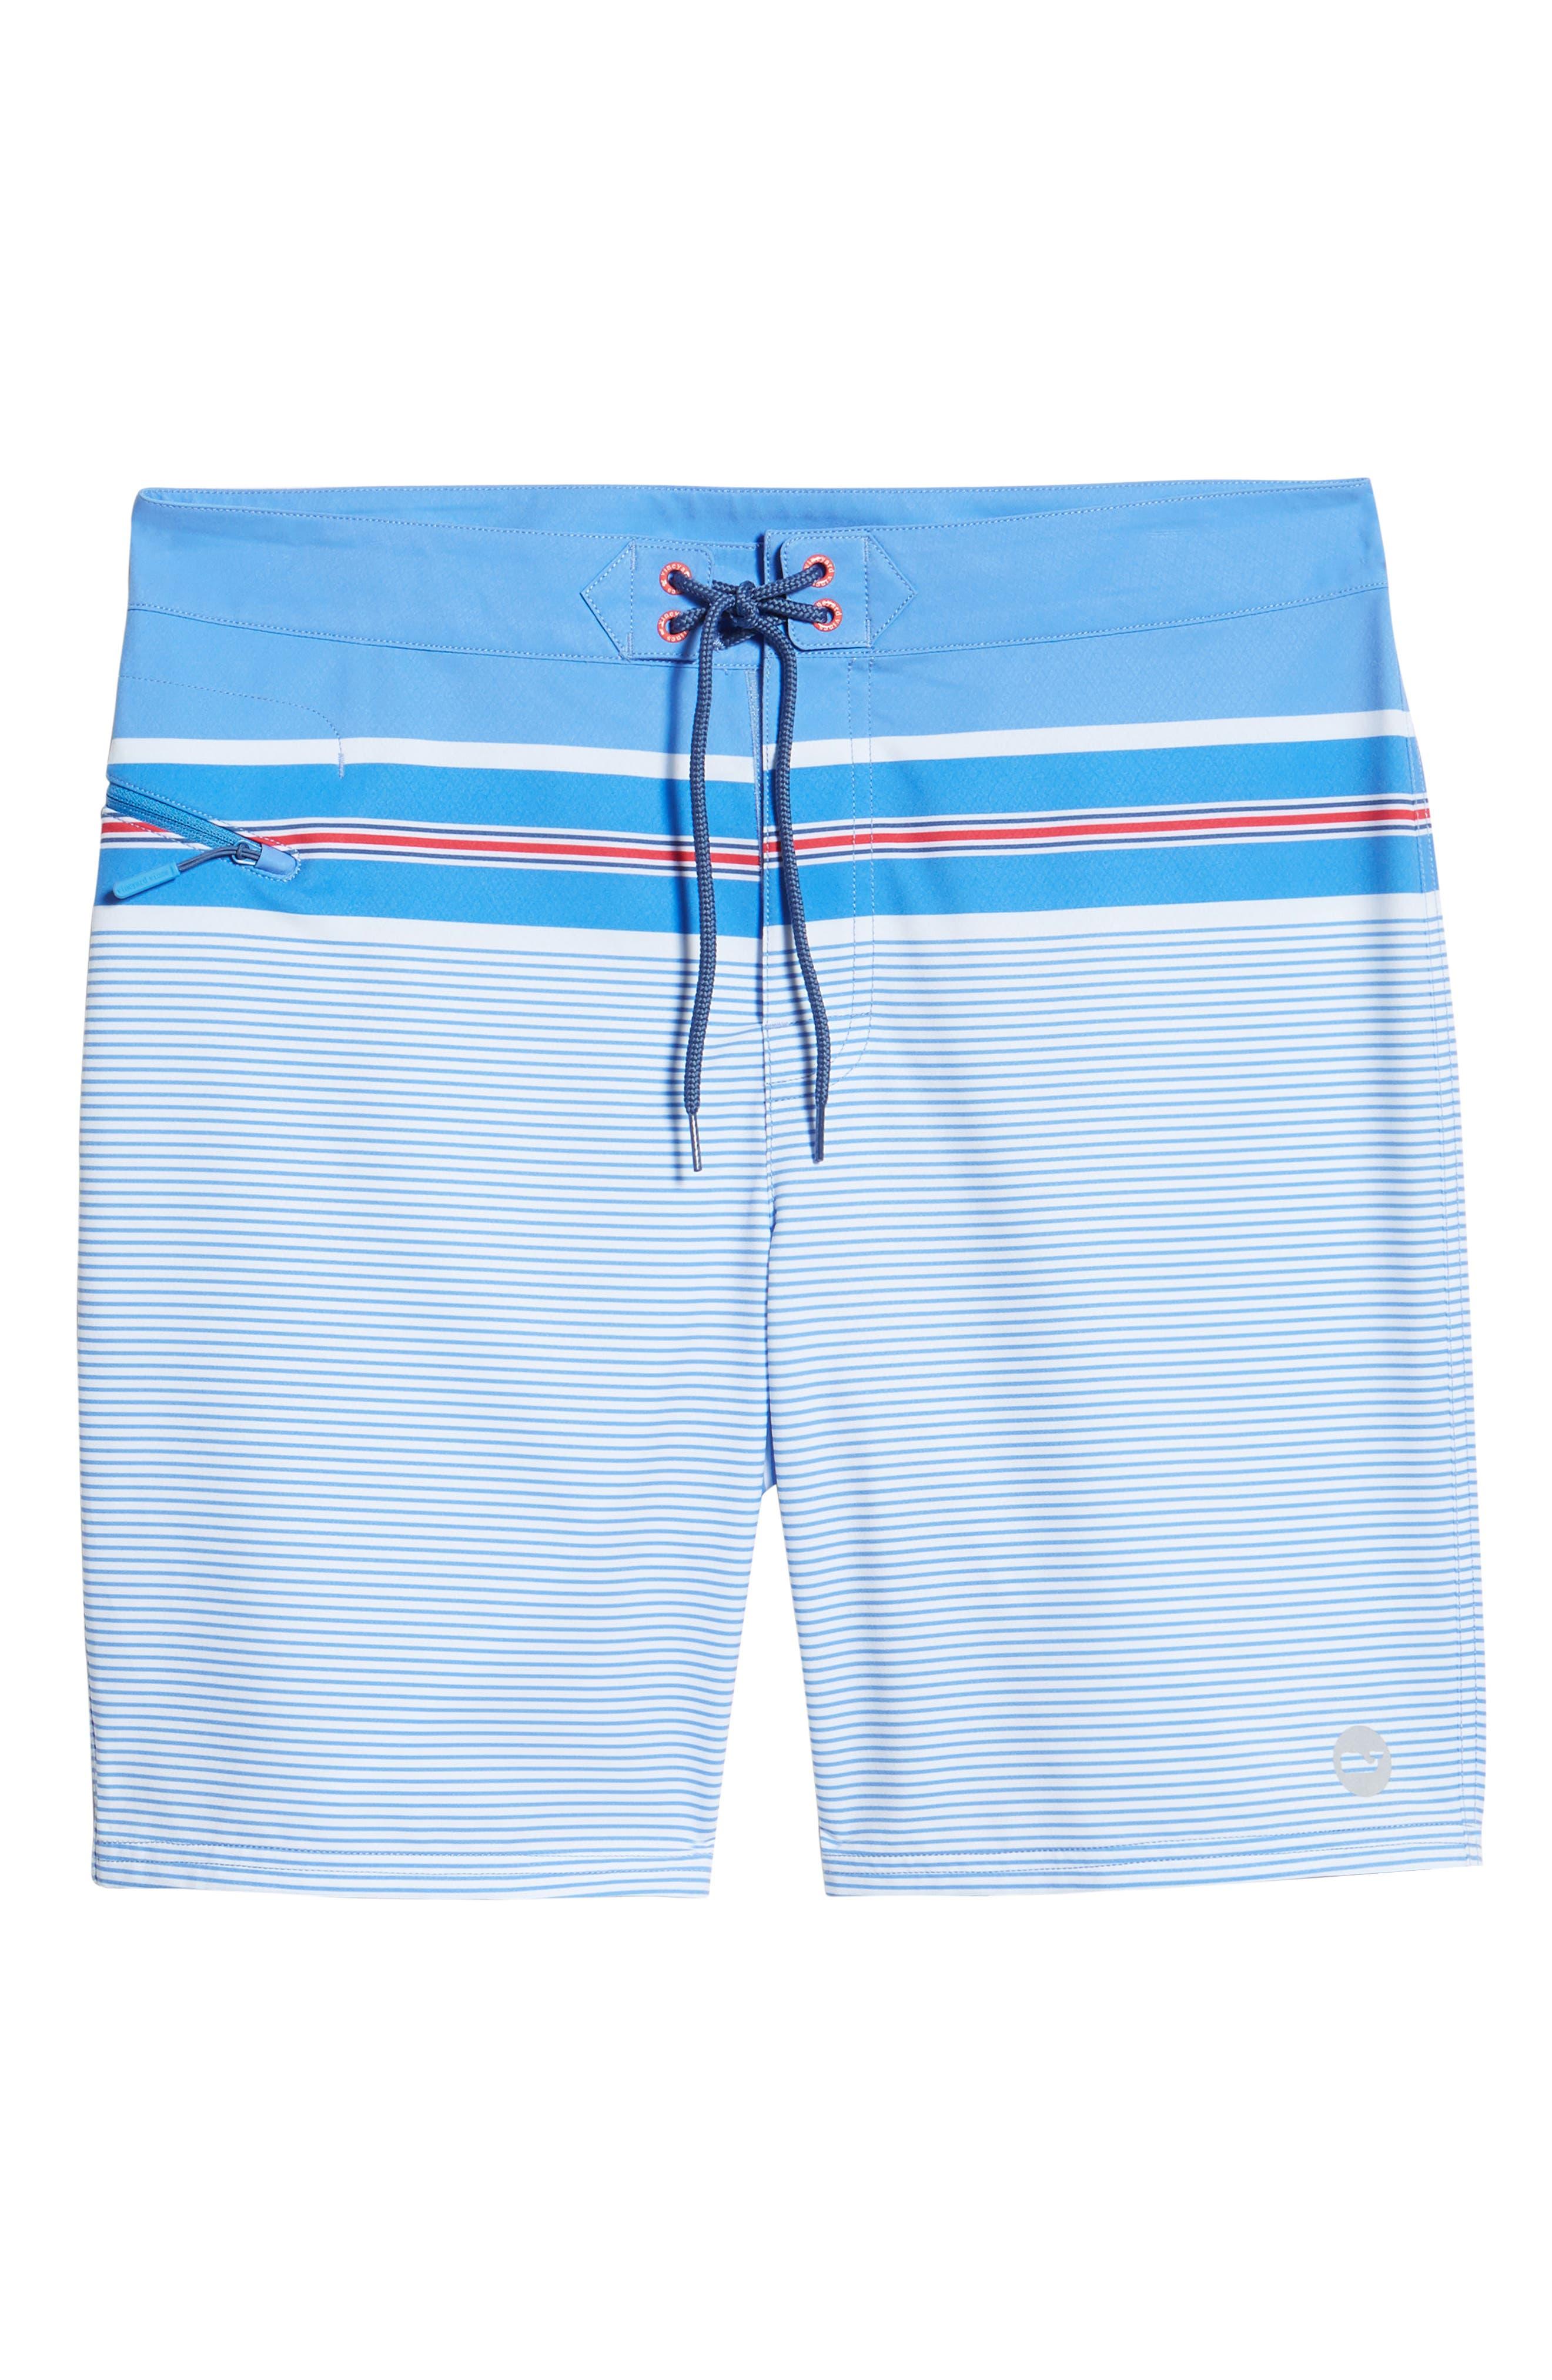 VINEYARD VINES,                             Birchcliff Stripe Board Shorts,                             Alternate thumbnail 6, color,                             484